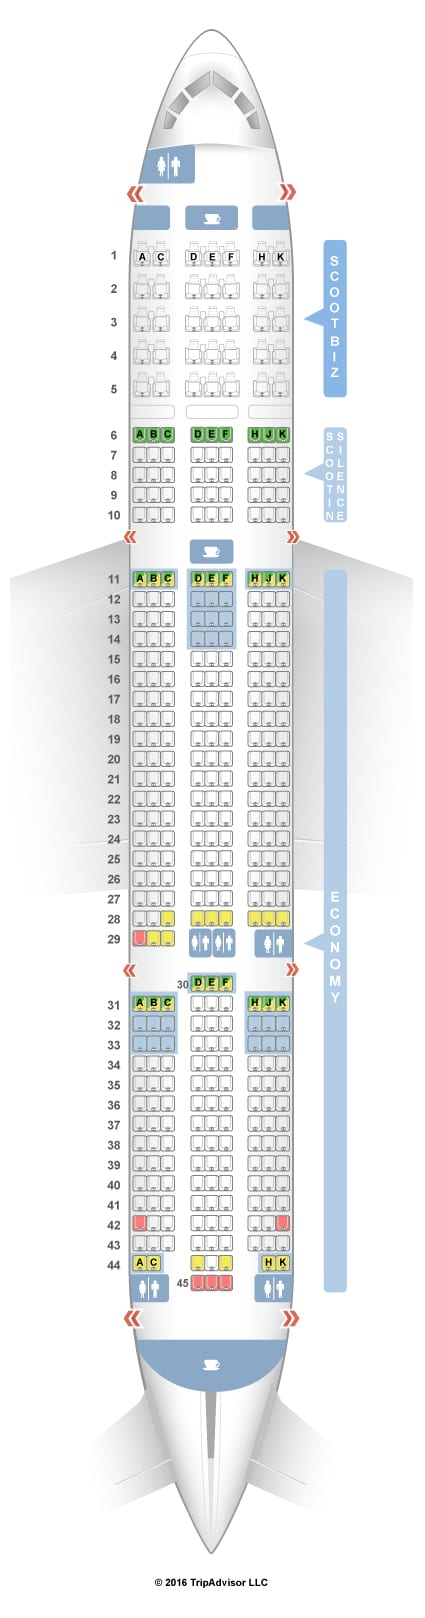 flight seat cabin plan